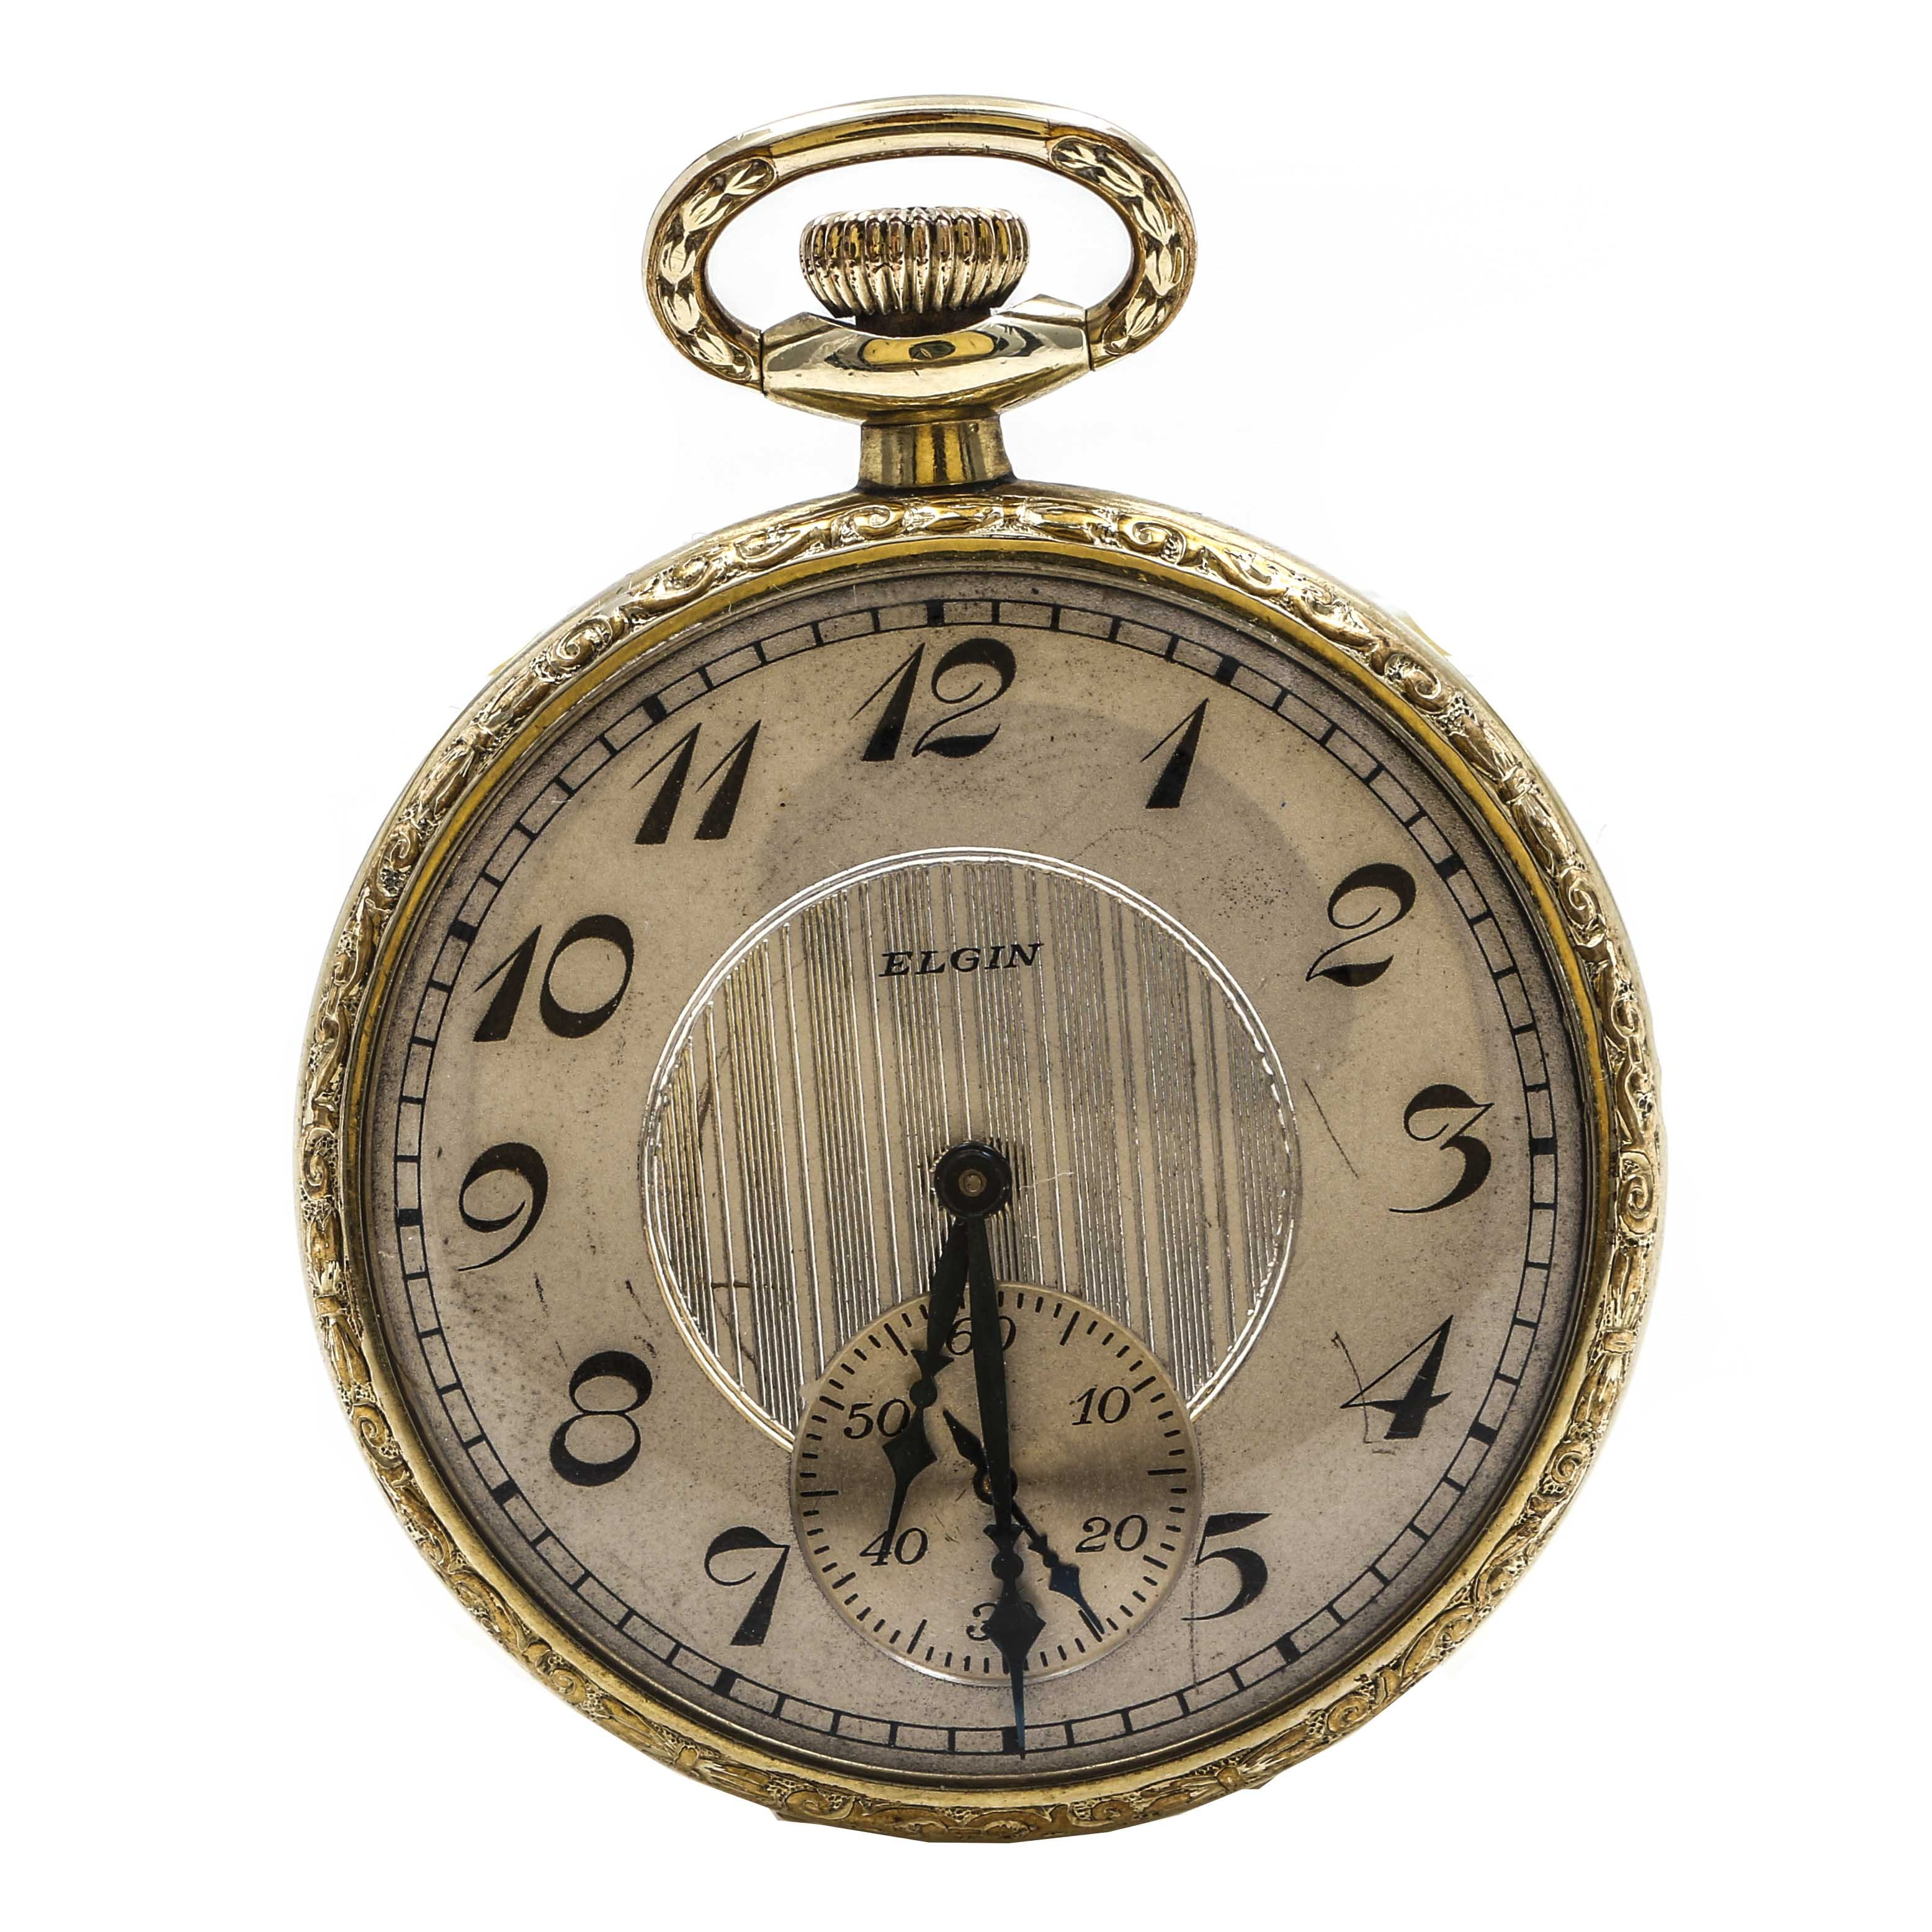 Circa 1924 Gold Filled Elgin Pocket Watch